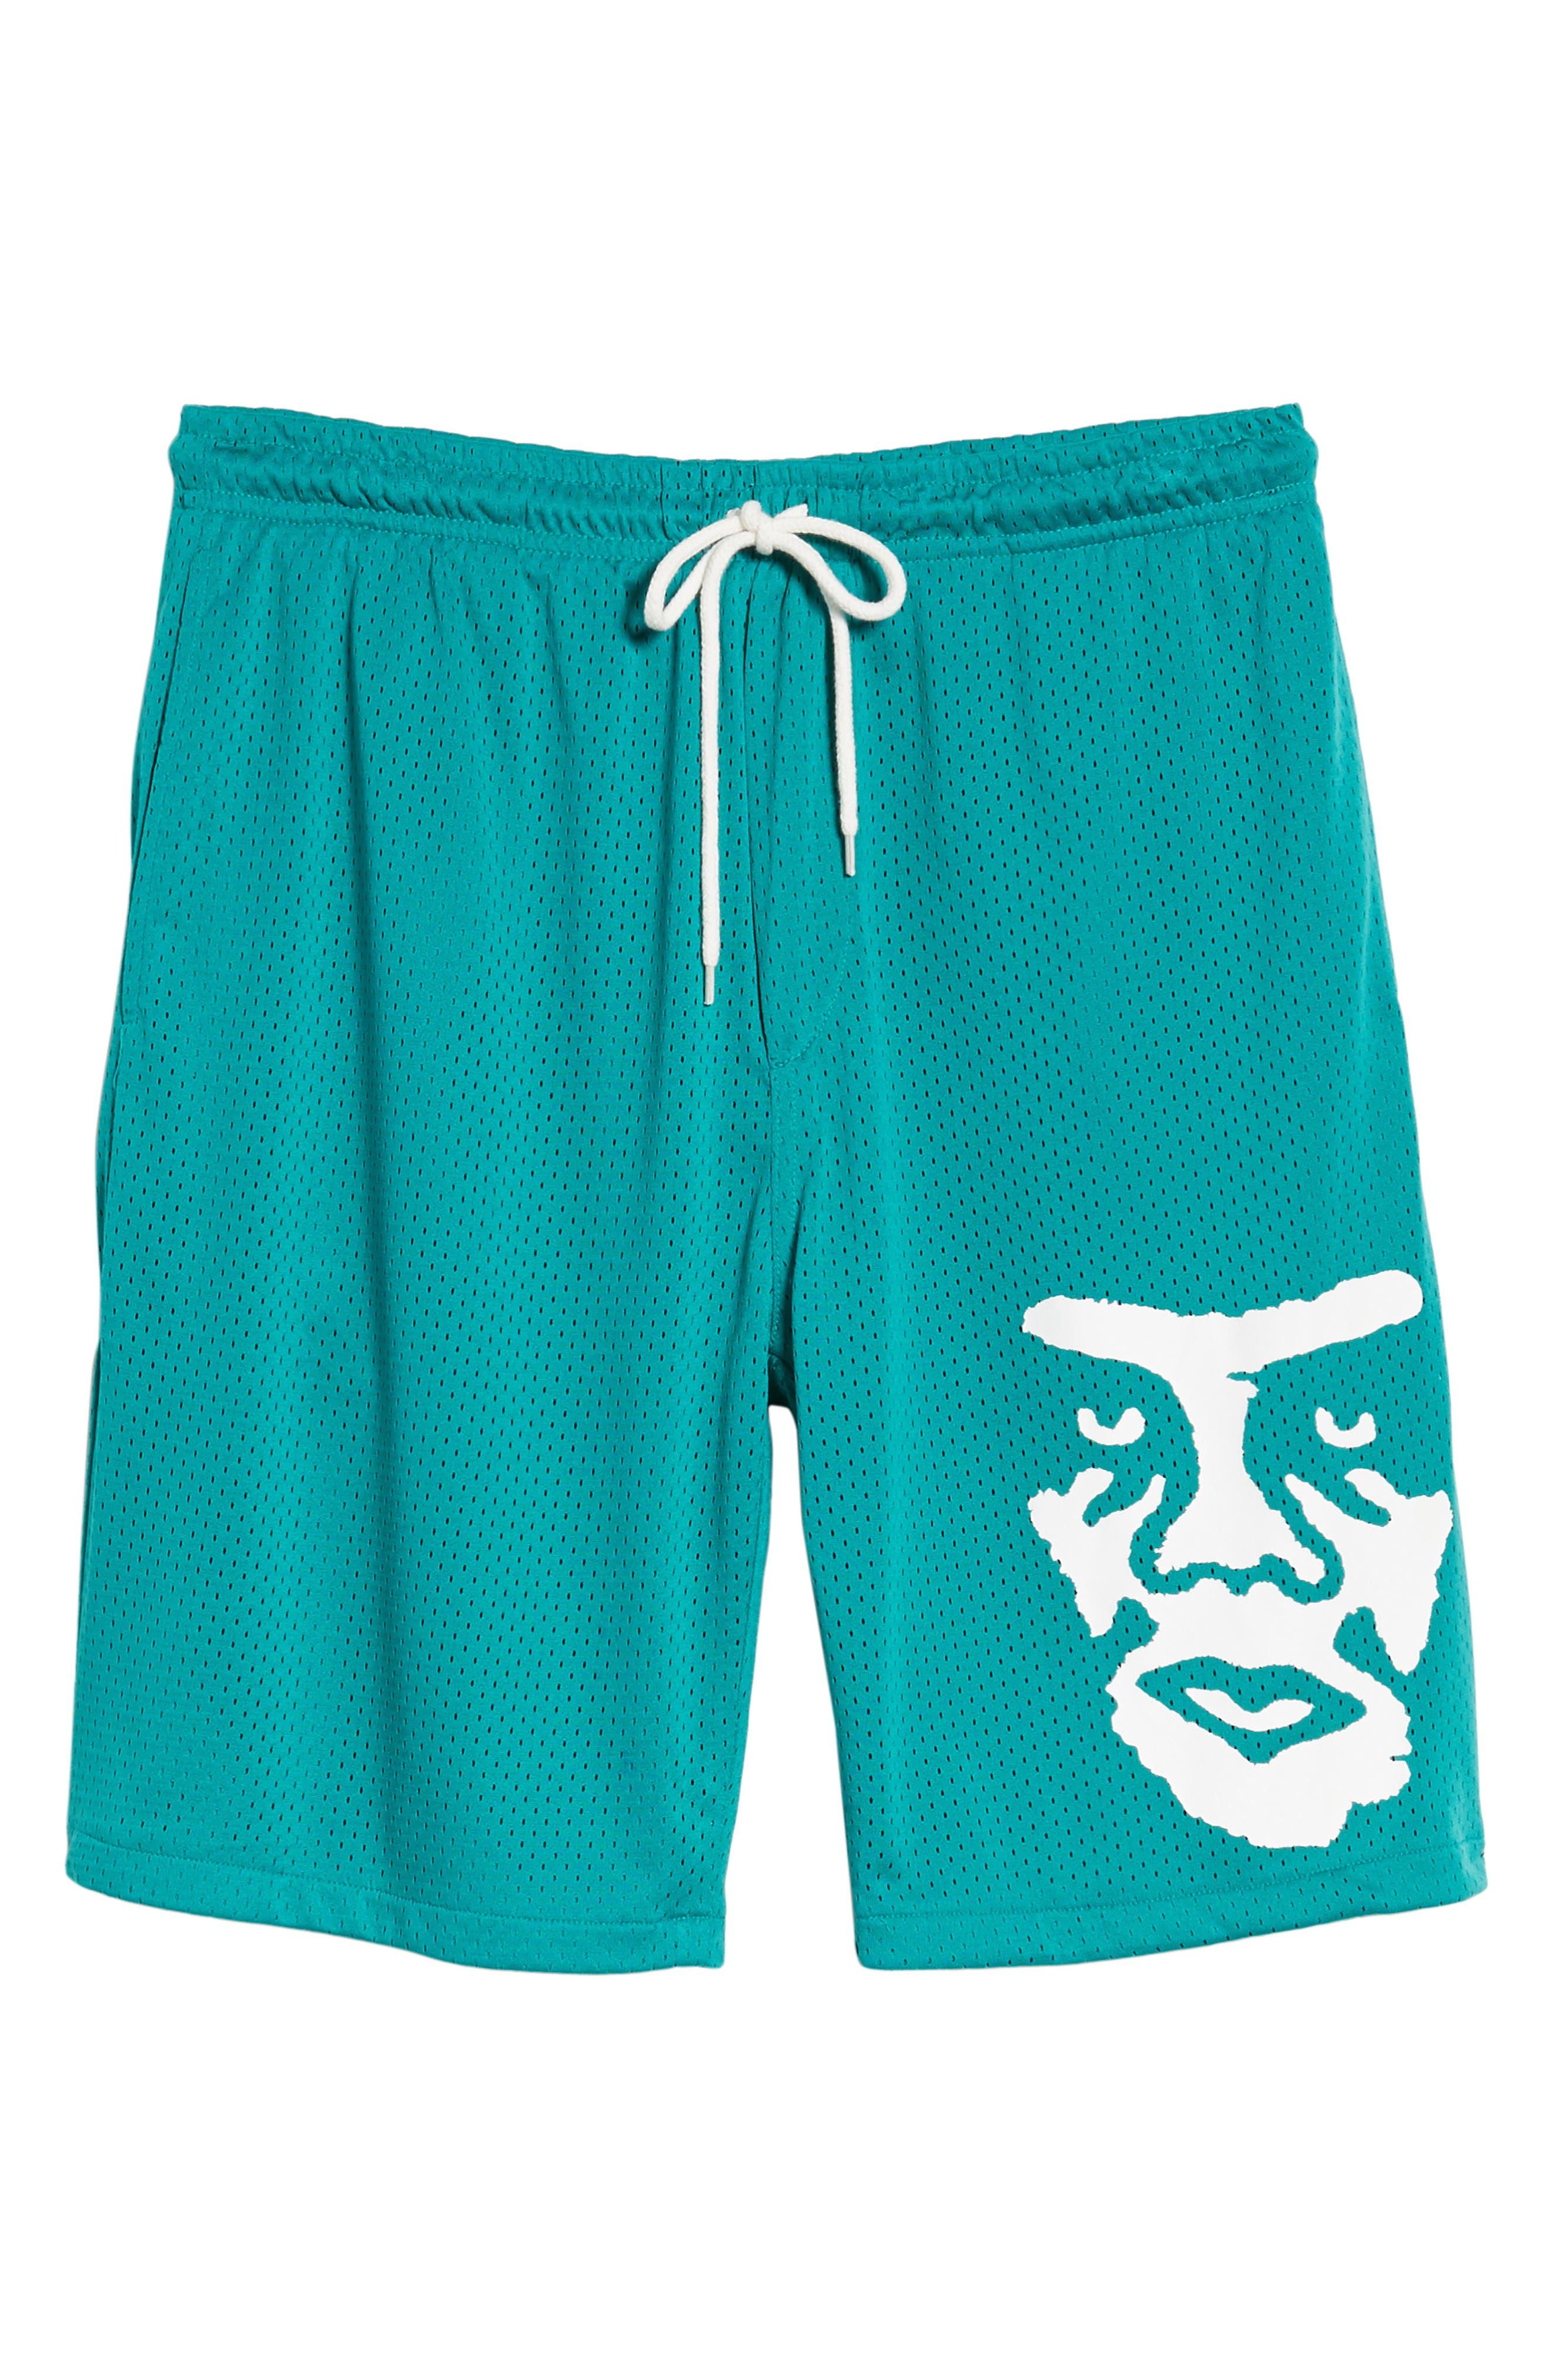 O.P.E. Athletic Shorts,                             Alternate thumbnail 6, color,                             Teal